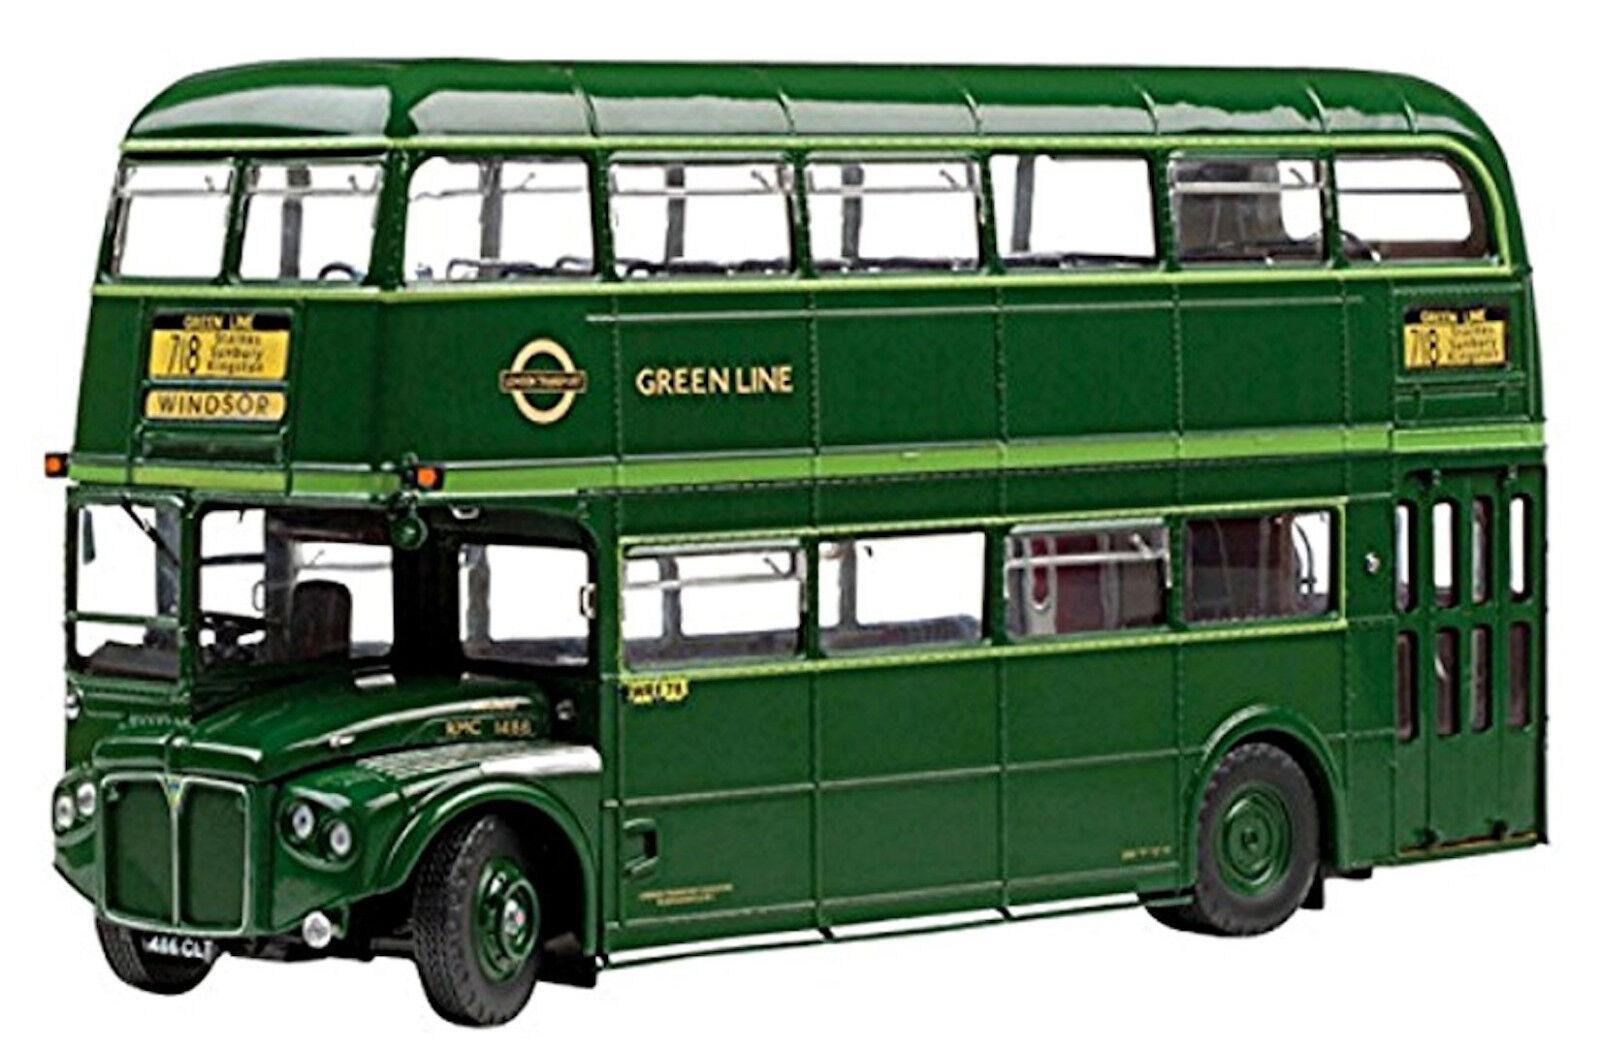 Autobús Autobús Autobús routemaster rmc1469 - 469clt - 1958 línea verde 1  24 sunEstrella 2912 f16